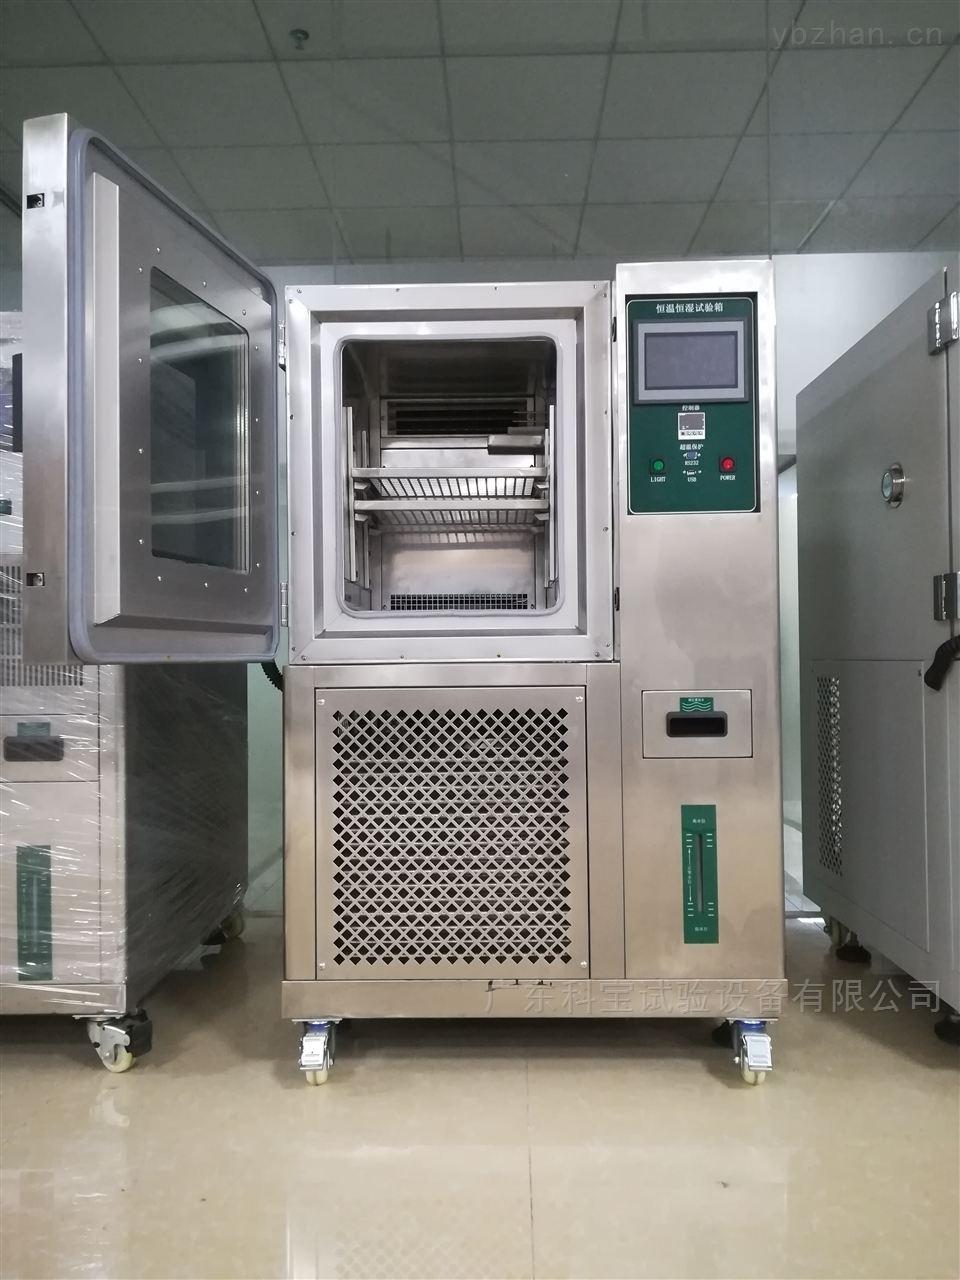 150L可程式恒温恒湿試驗箱